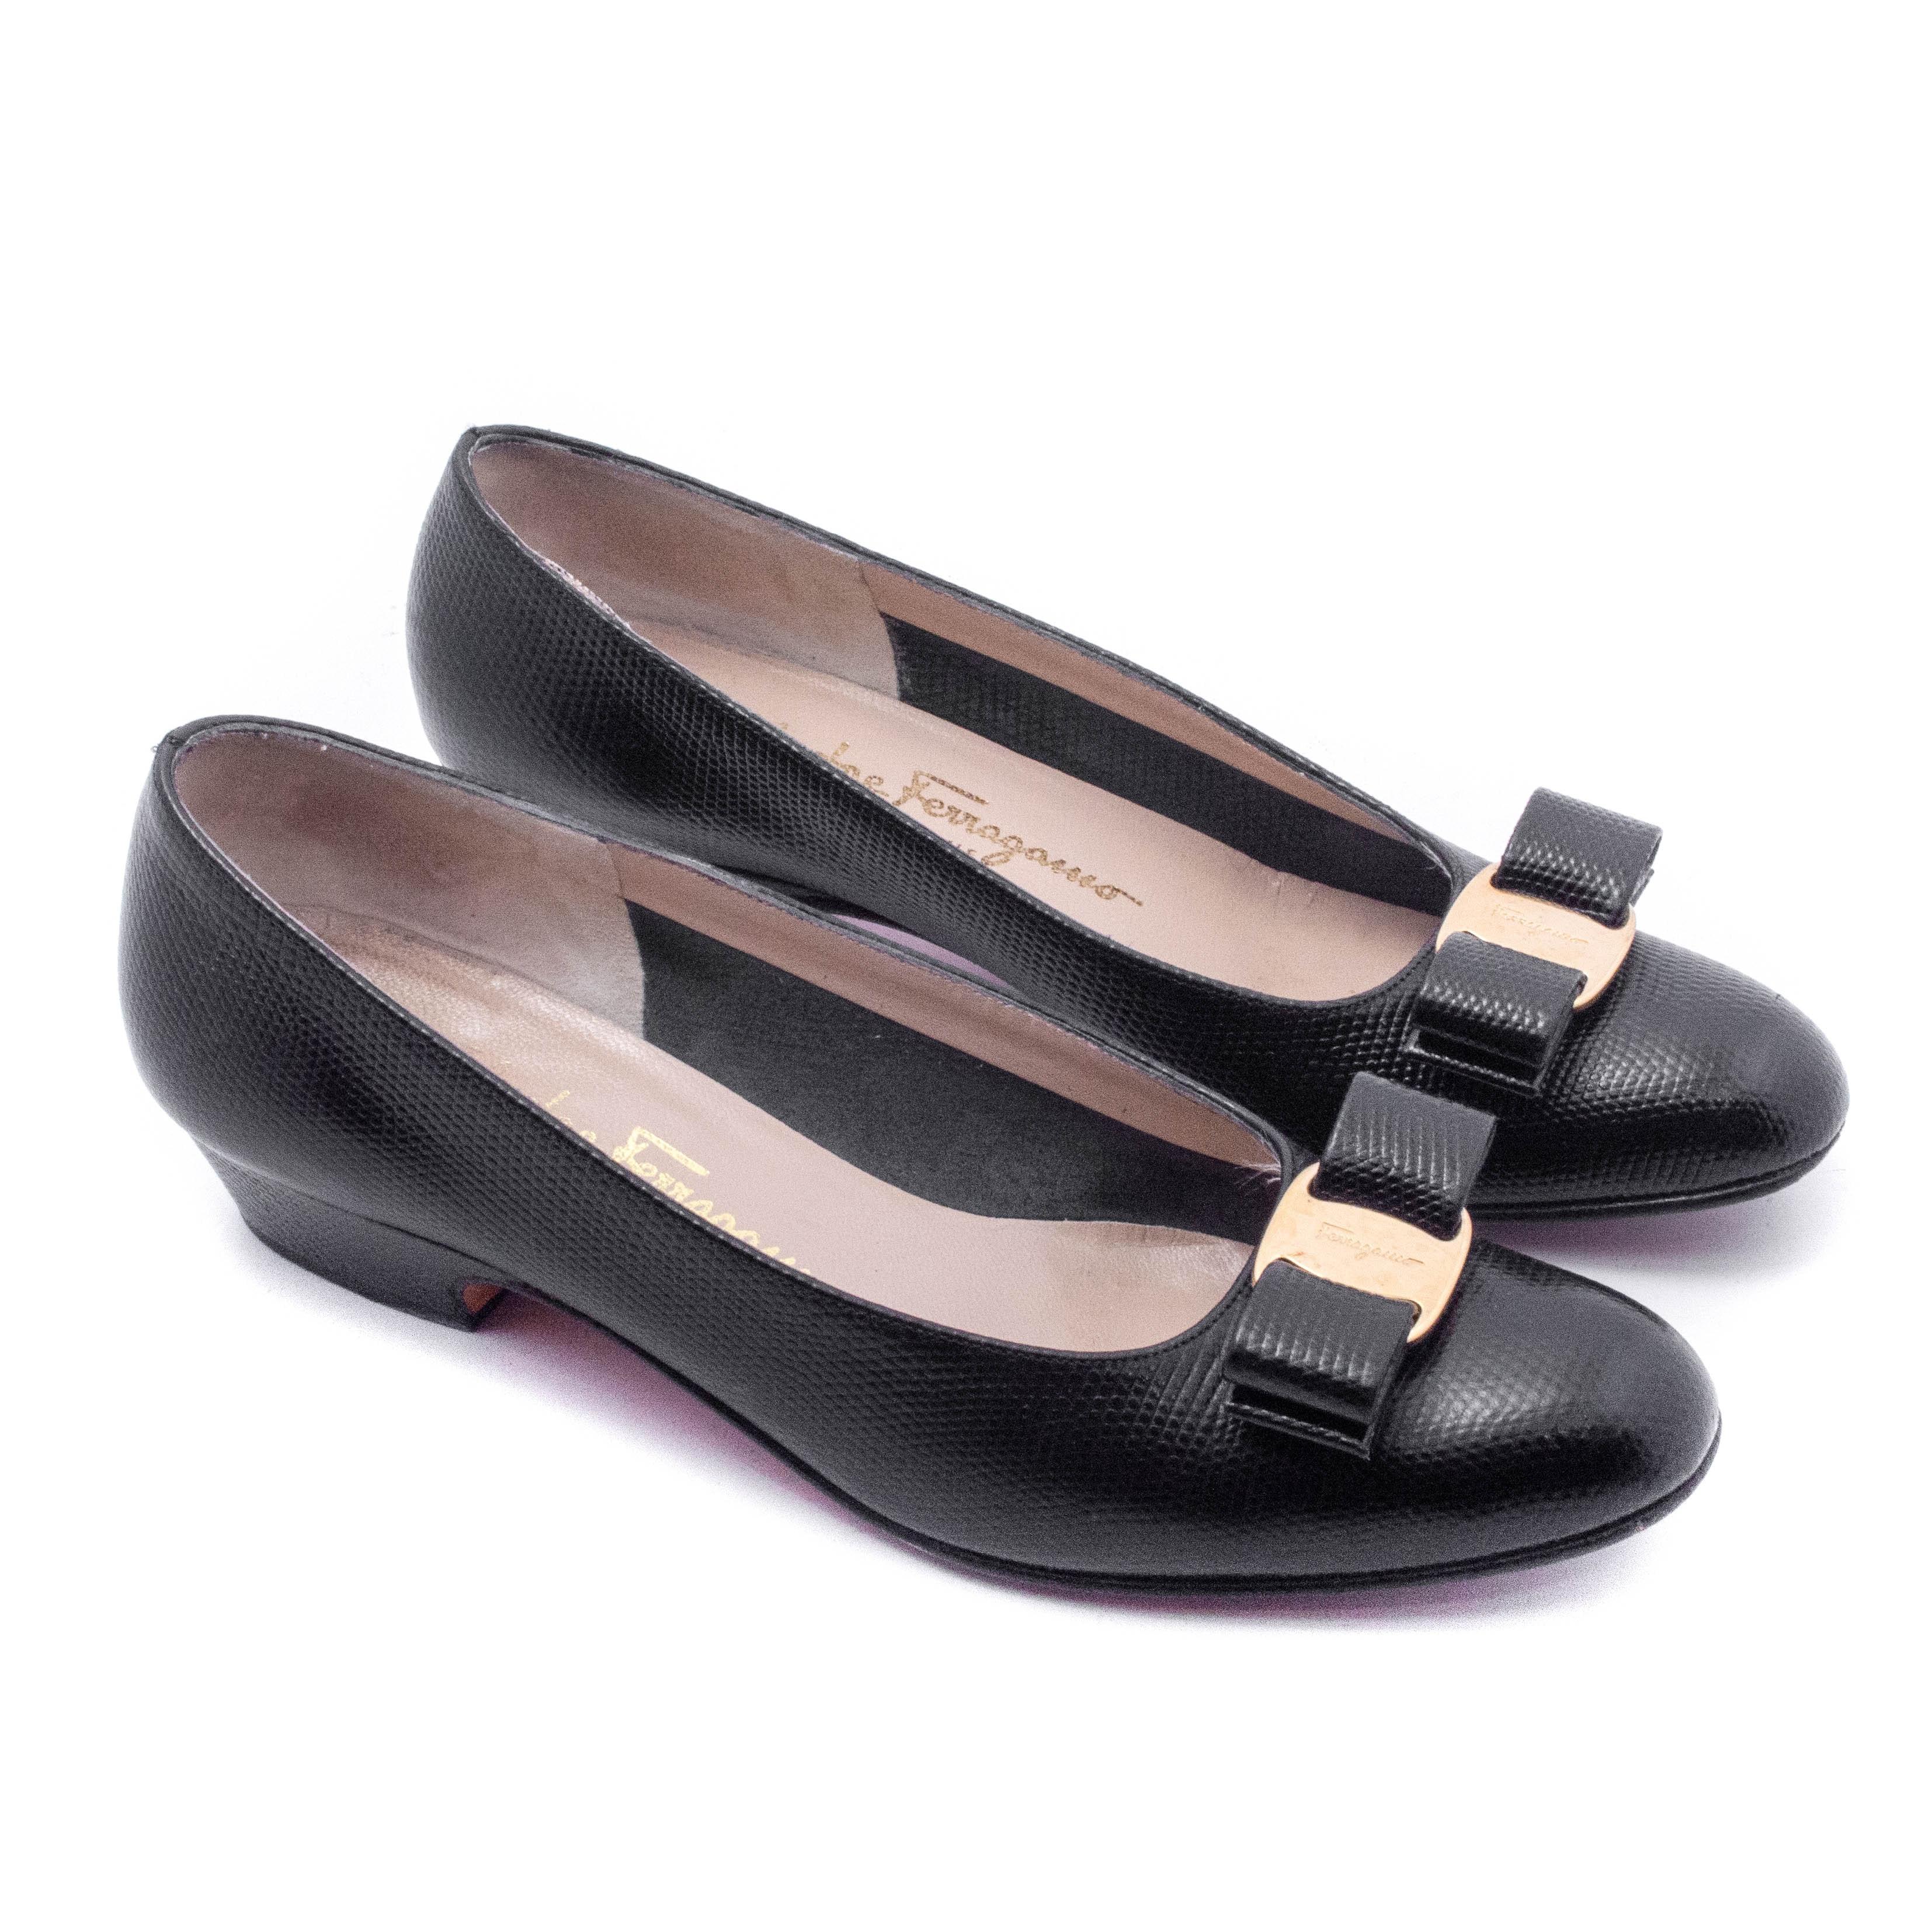 Salvatore Ferragamo Boutique Lizard Embossed Black Leather Low Heels